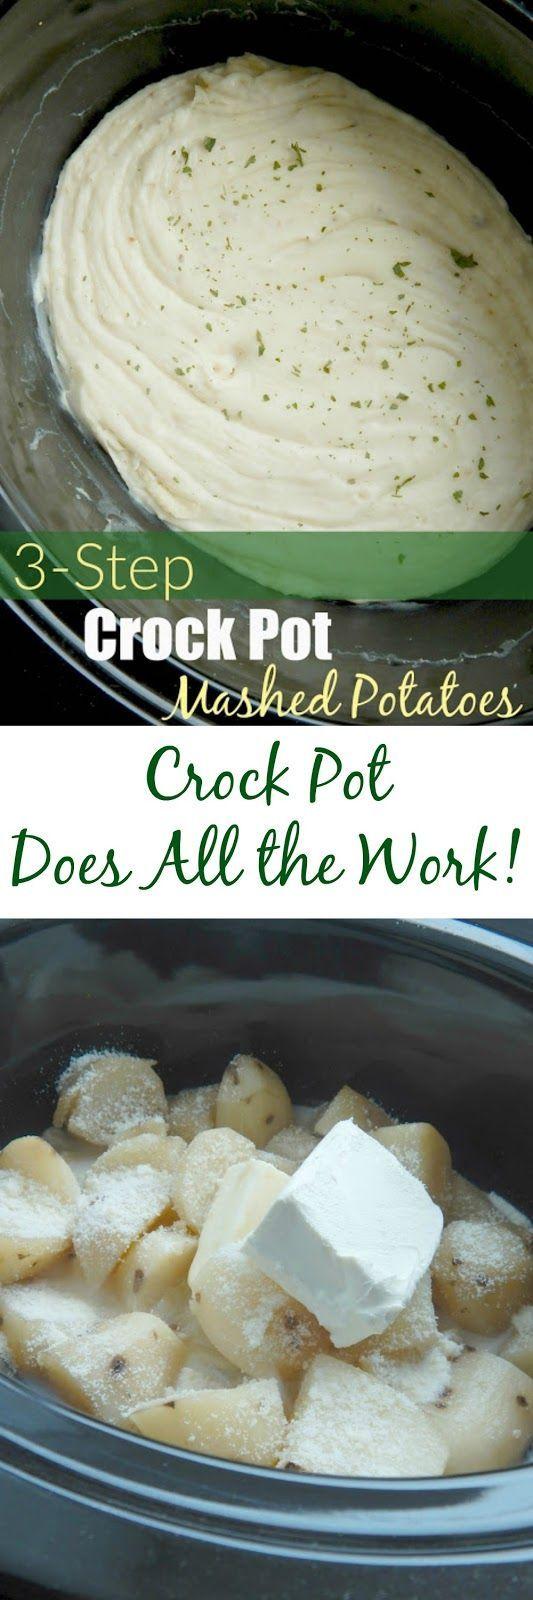 3 step crock pot mashed potatoes (sweetandsavoryfood.com)